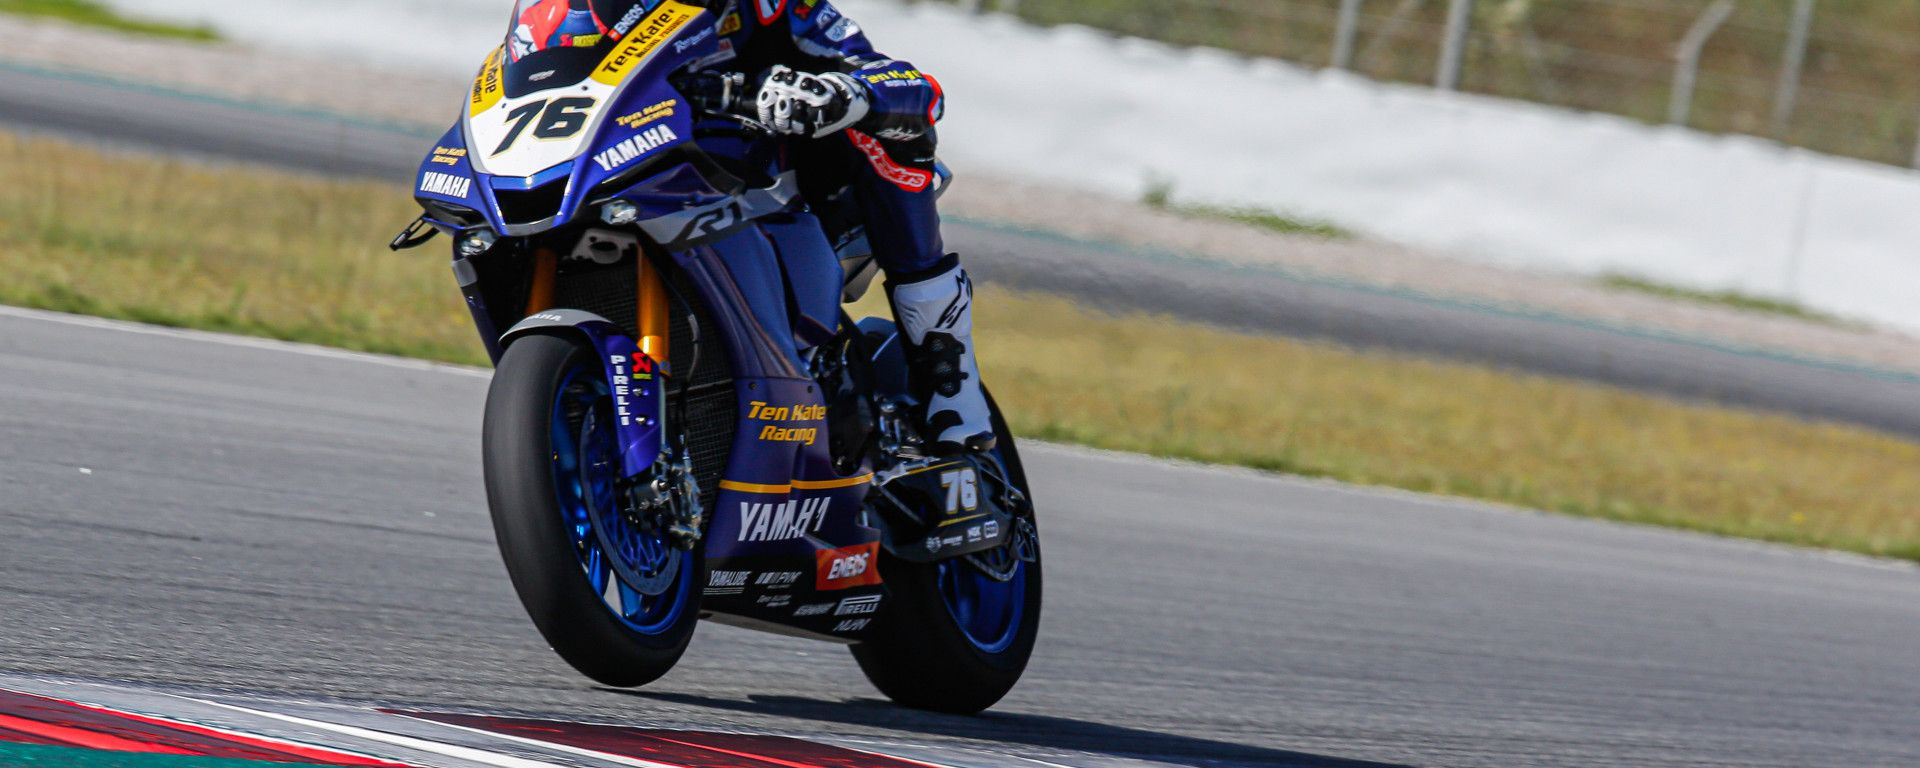 Test Superbike Barcellona, day 2: Loris Baz (Yamaha)